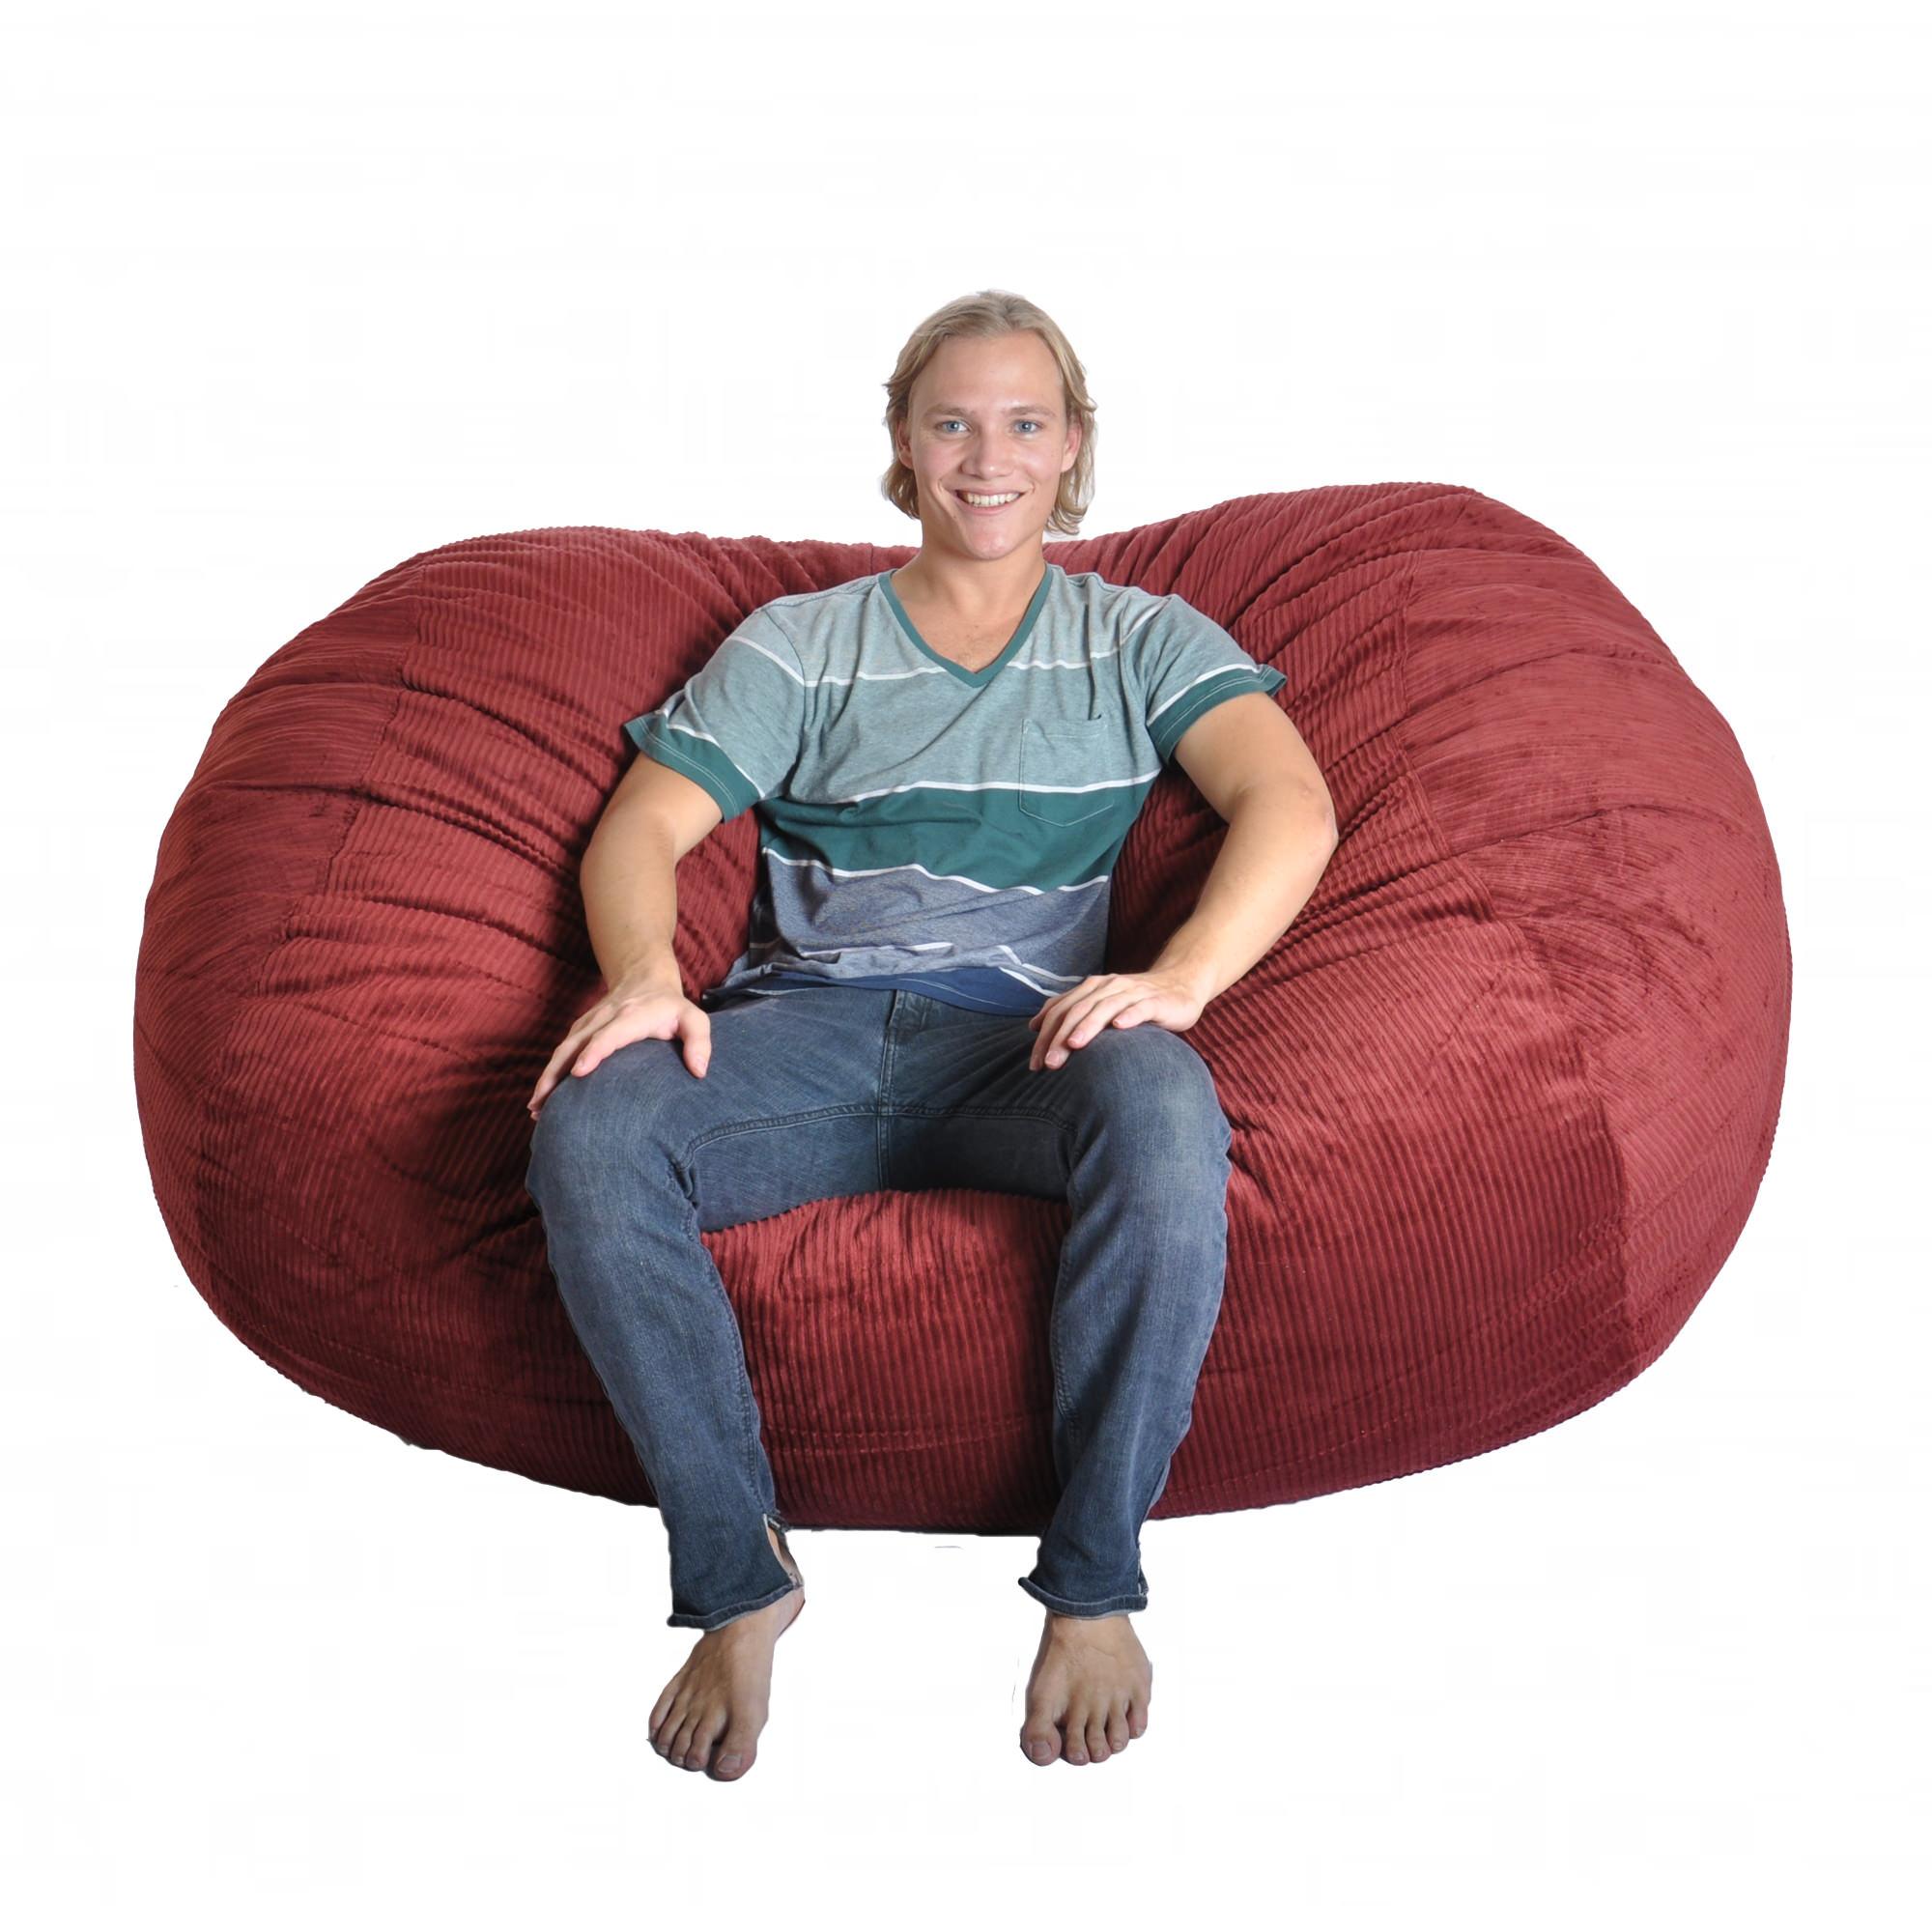 Sofa Beanbag Bergundy Corduroy